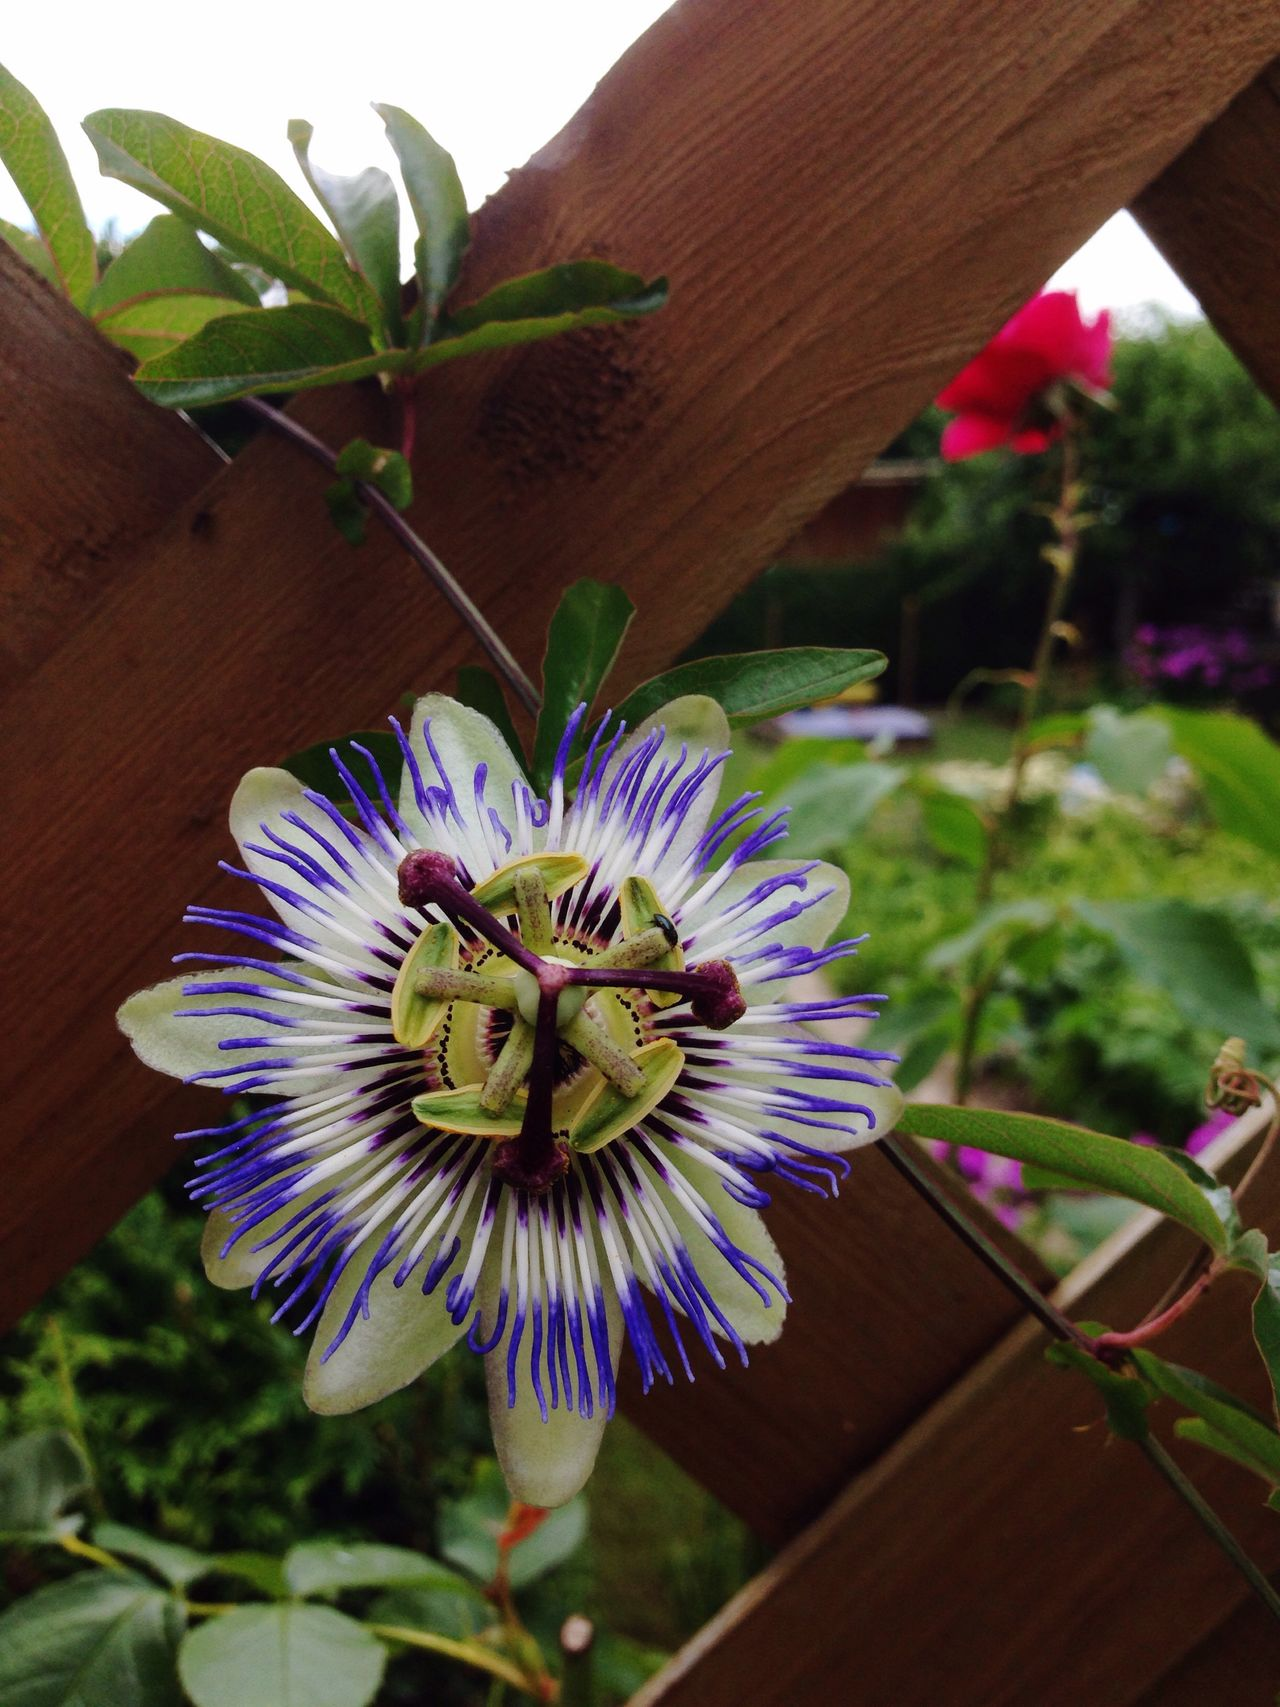 Flower Hobby Garden Photography Garden Flourishing Passionfruit Passionflower Passionsblume Gardening